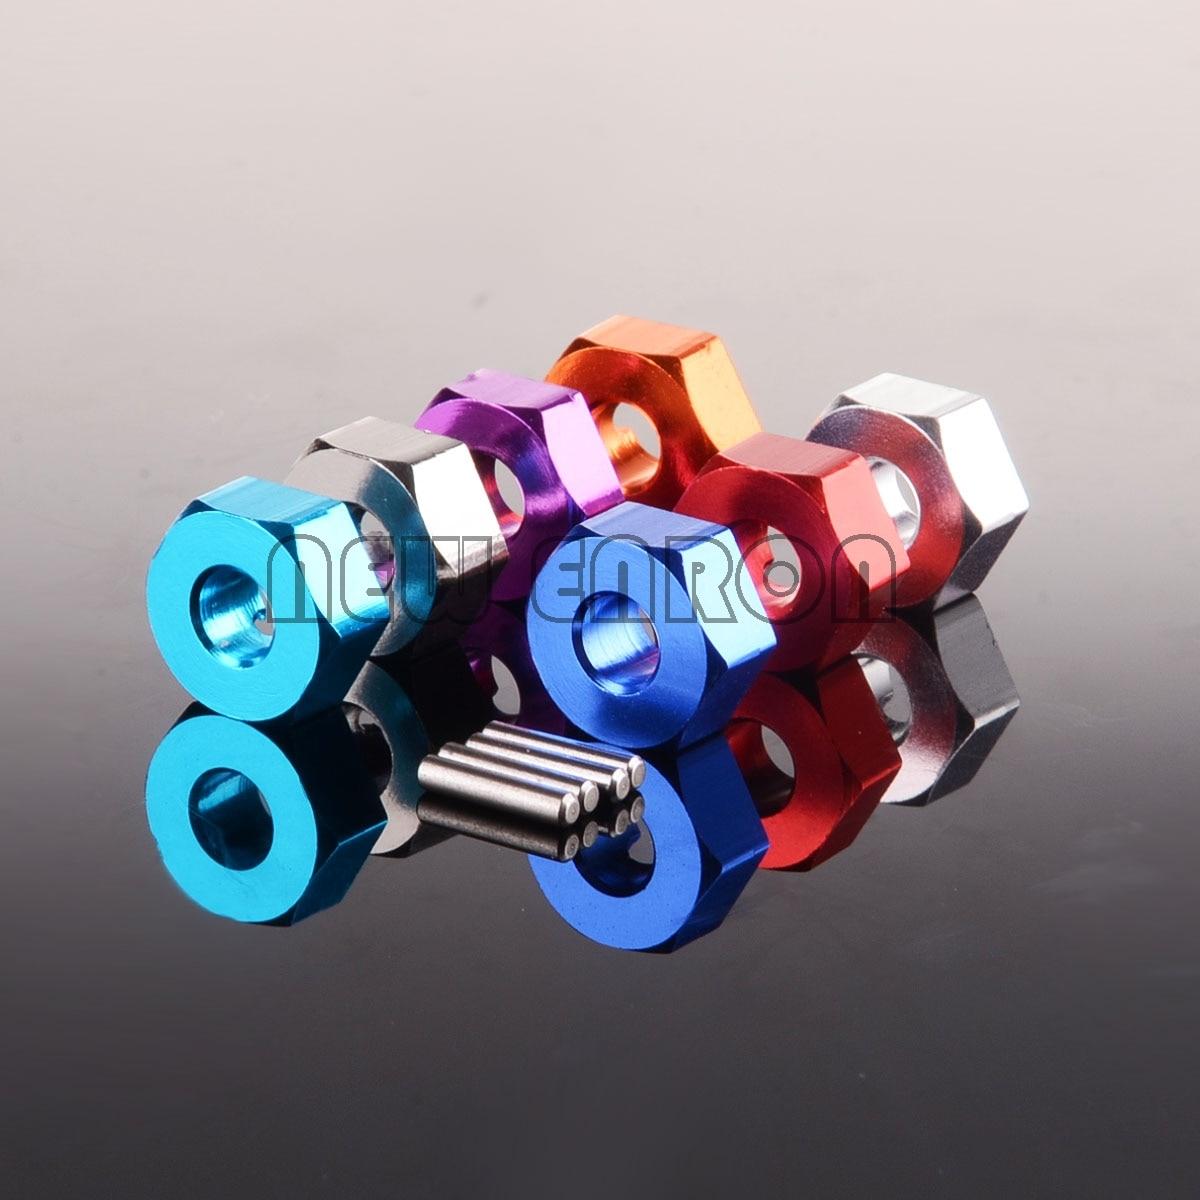 NEW ENRON 4P RC CAR 12MM Wheel Hex.Mount+PIN Aluminum For RC 1:10 WLToys K949 CLIMBING K949-009